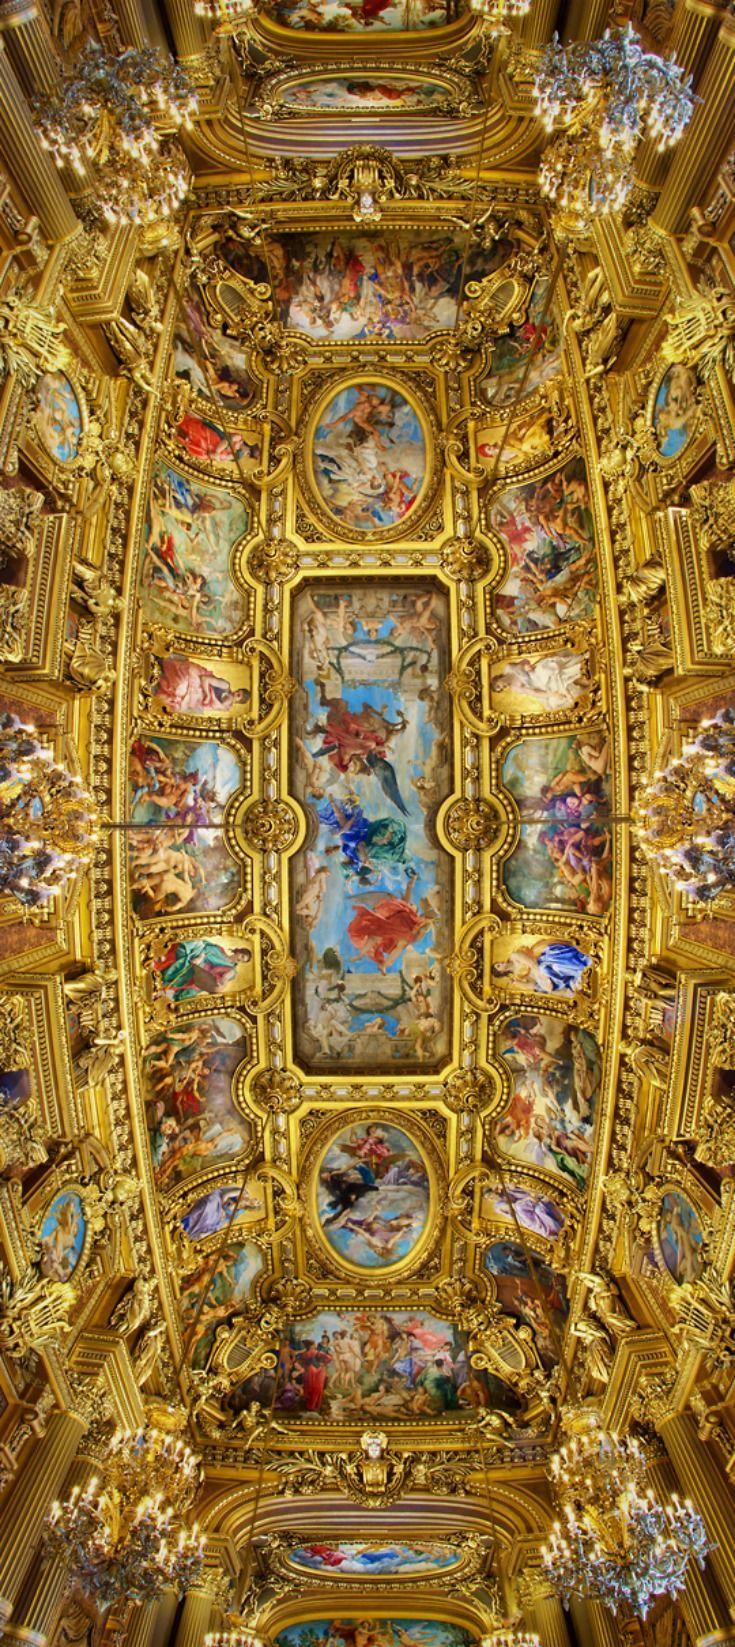 Ceiling, Opéra Garnier, Paris, France